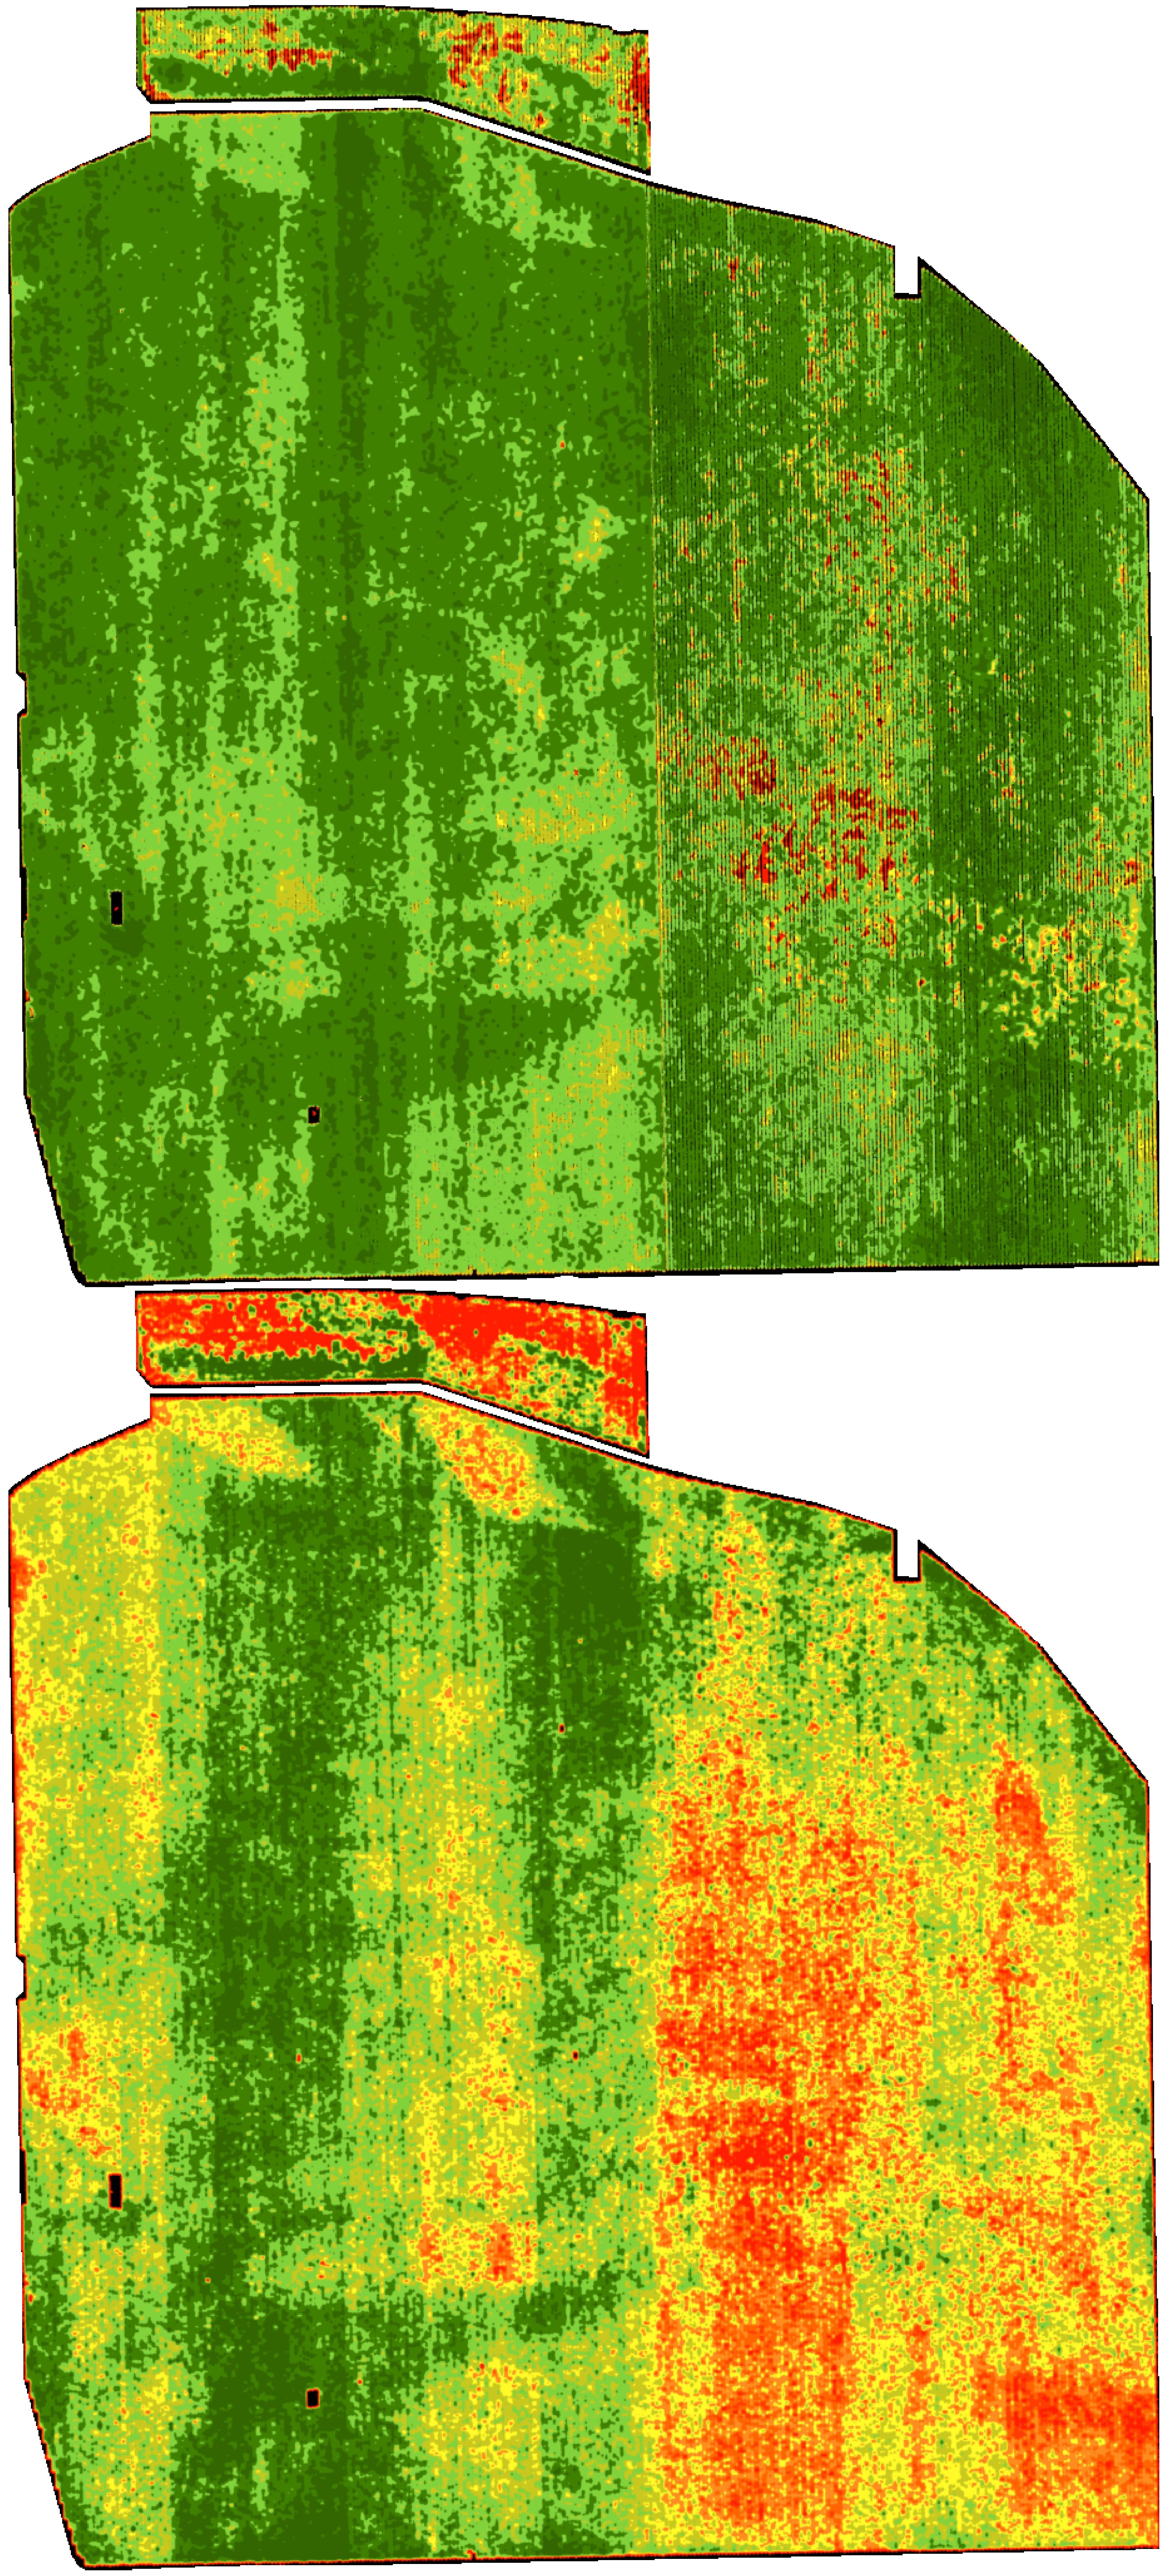 McManis-casestudy-imageryexamples-01